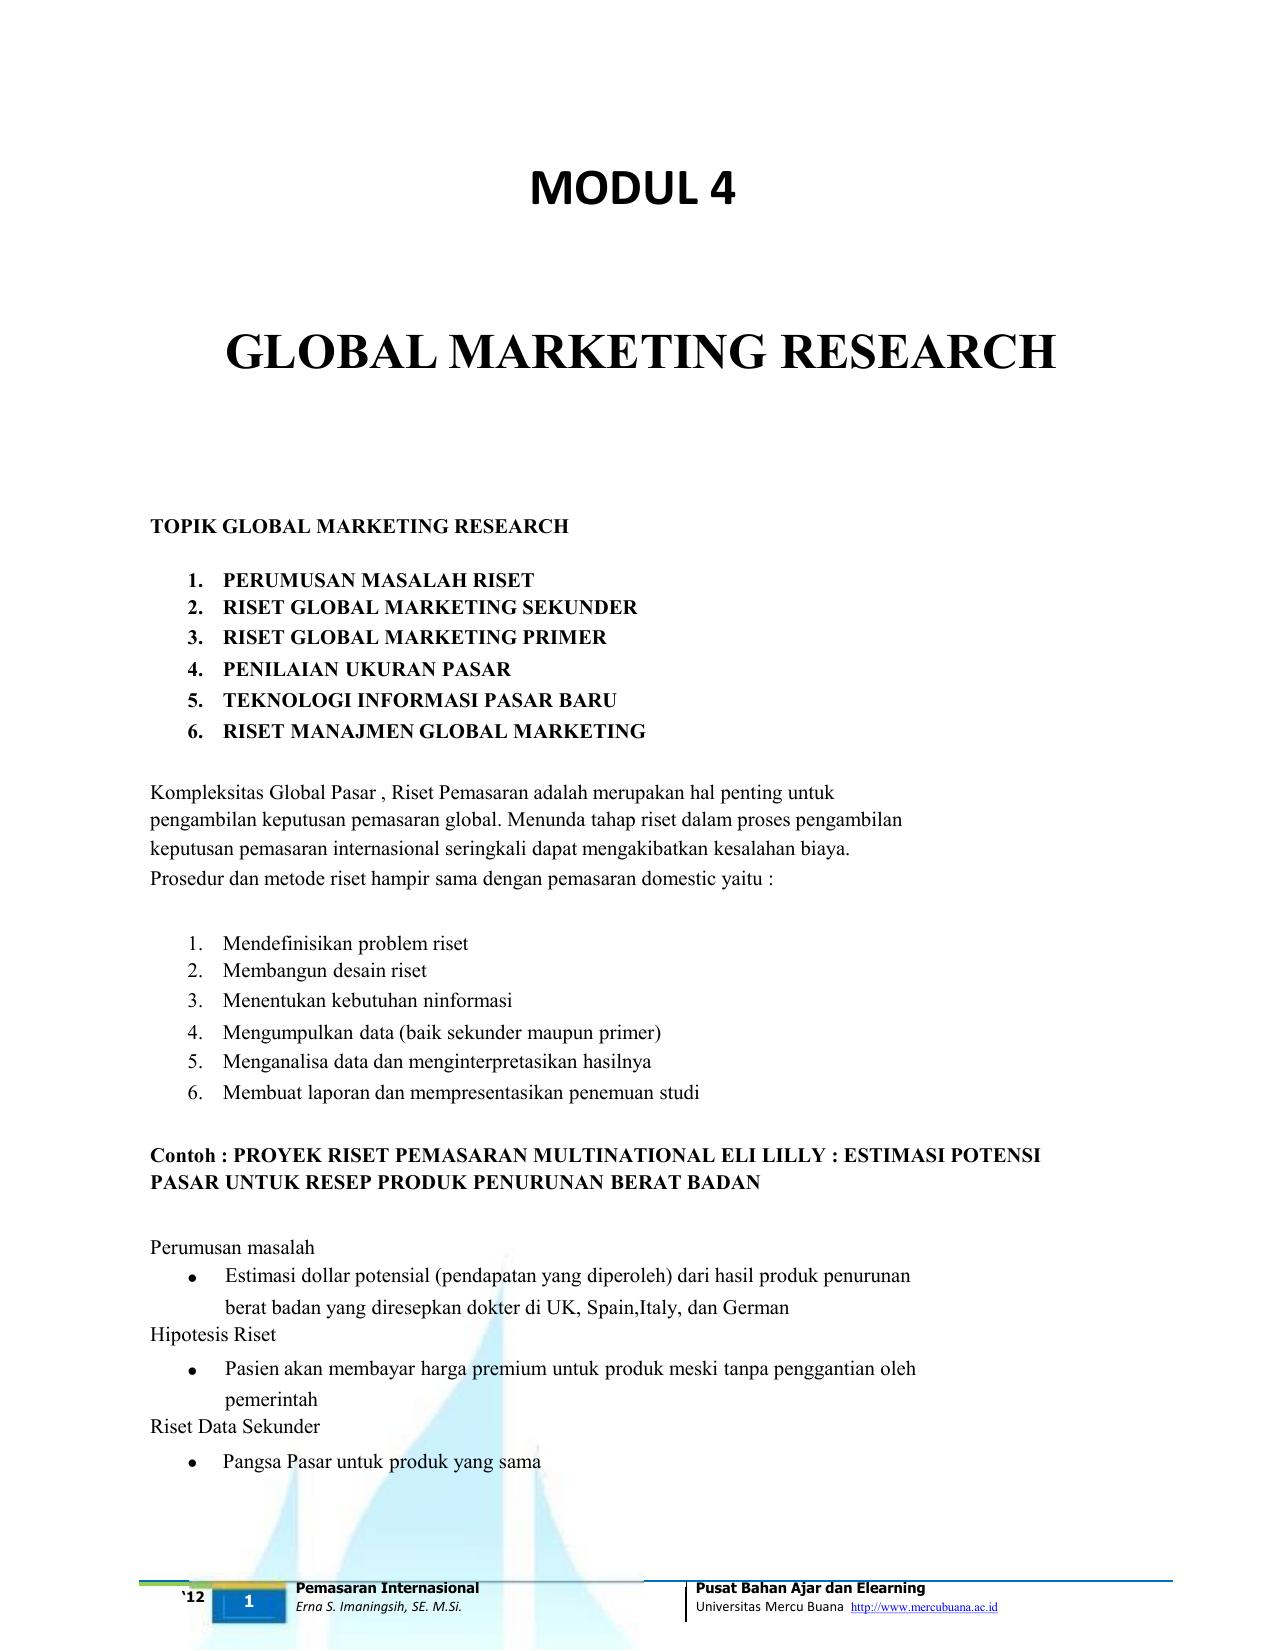 Modul 4 Pi Global Marketing